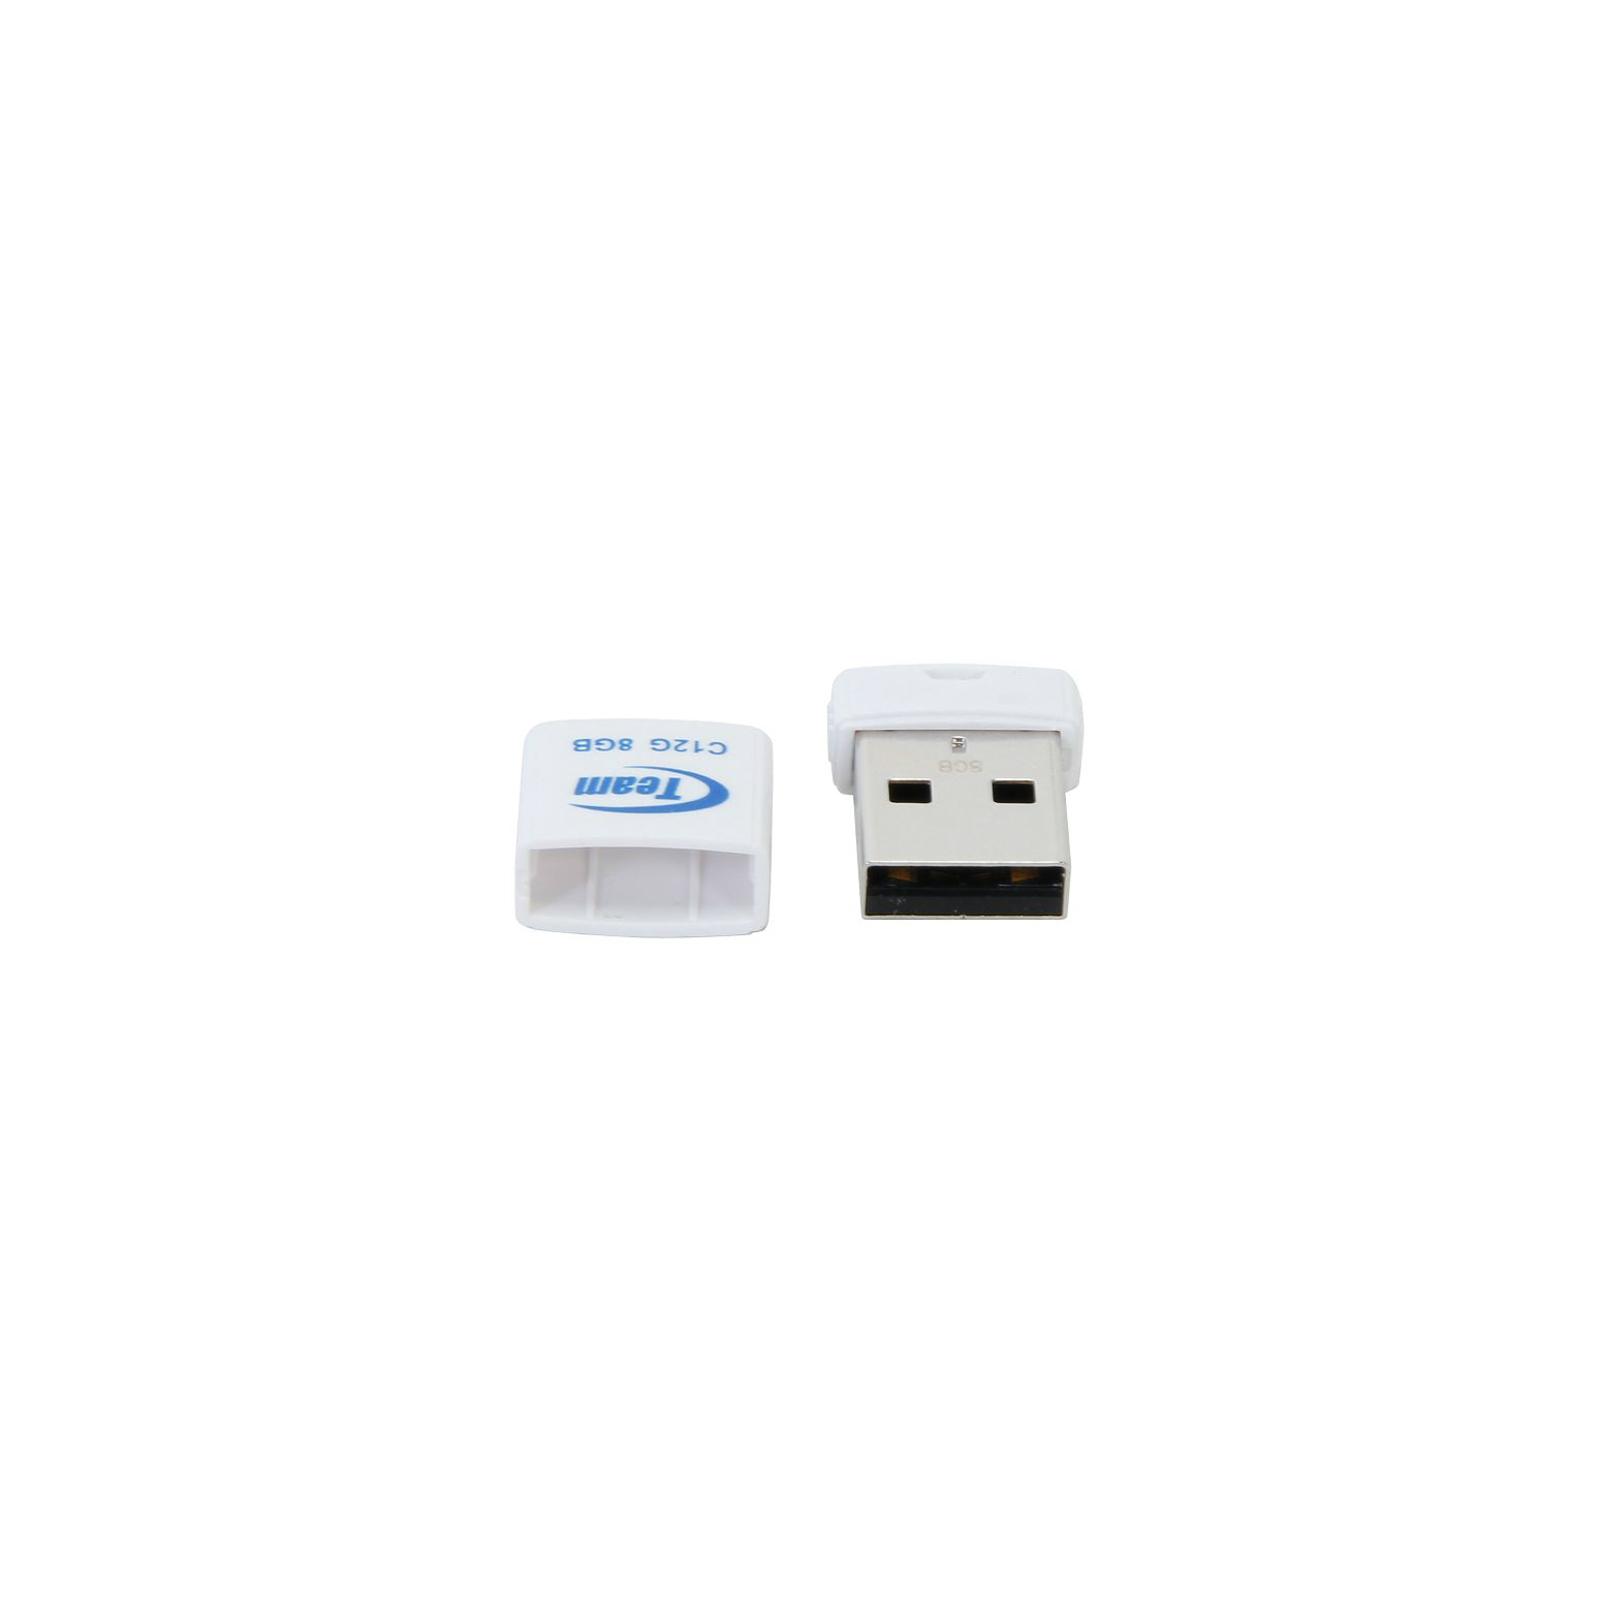 USB флеш накопитель Team 32GB C12G White USB 2.0 (TC12G32GW01) изображение 4